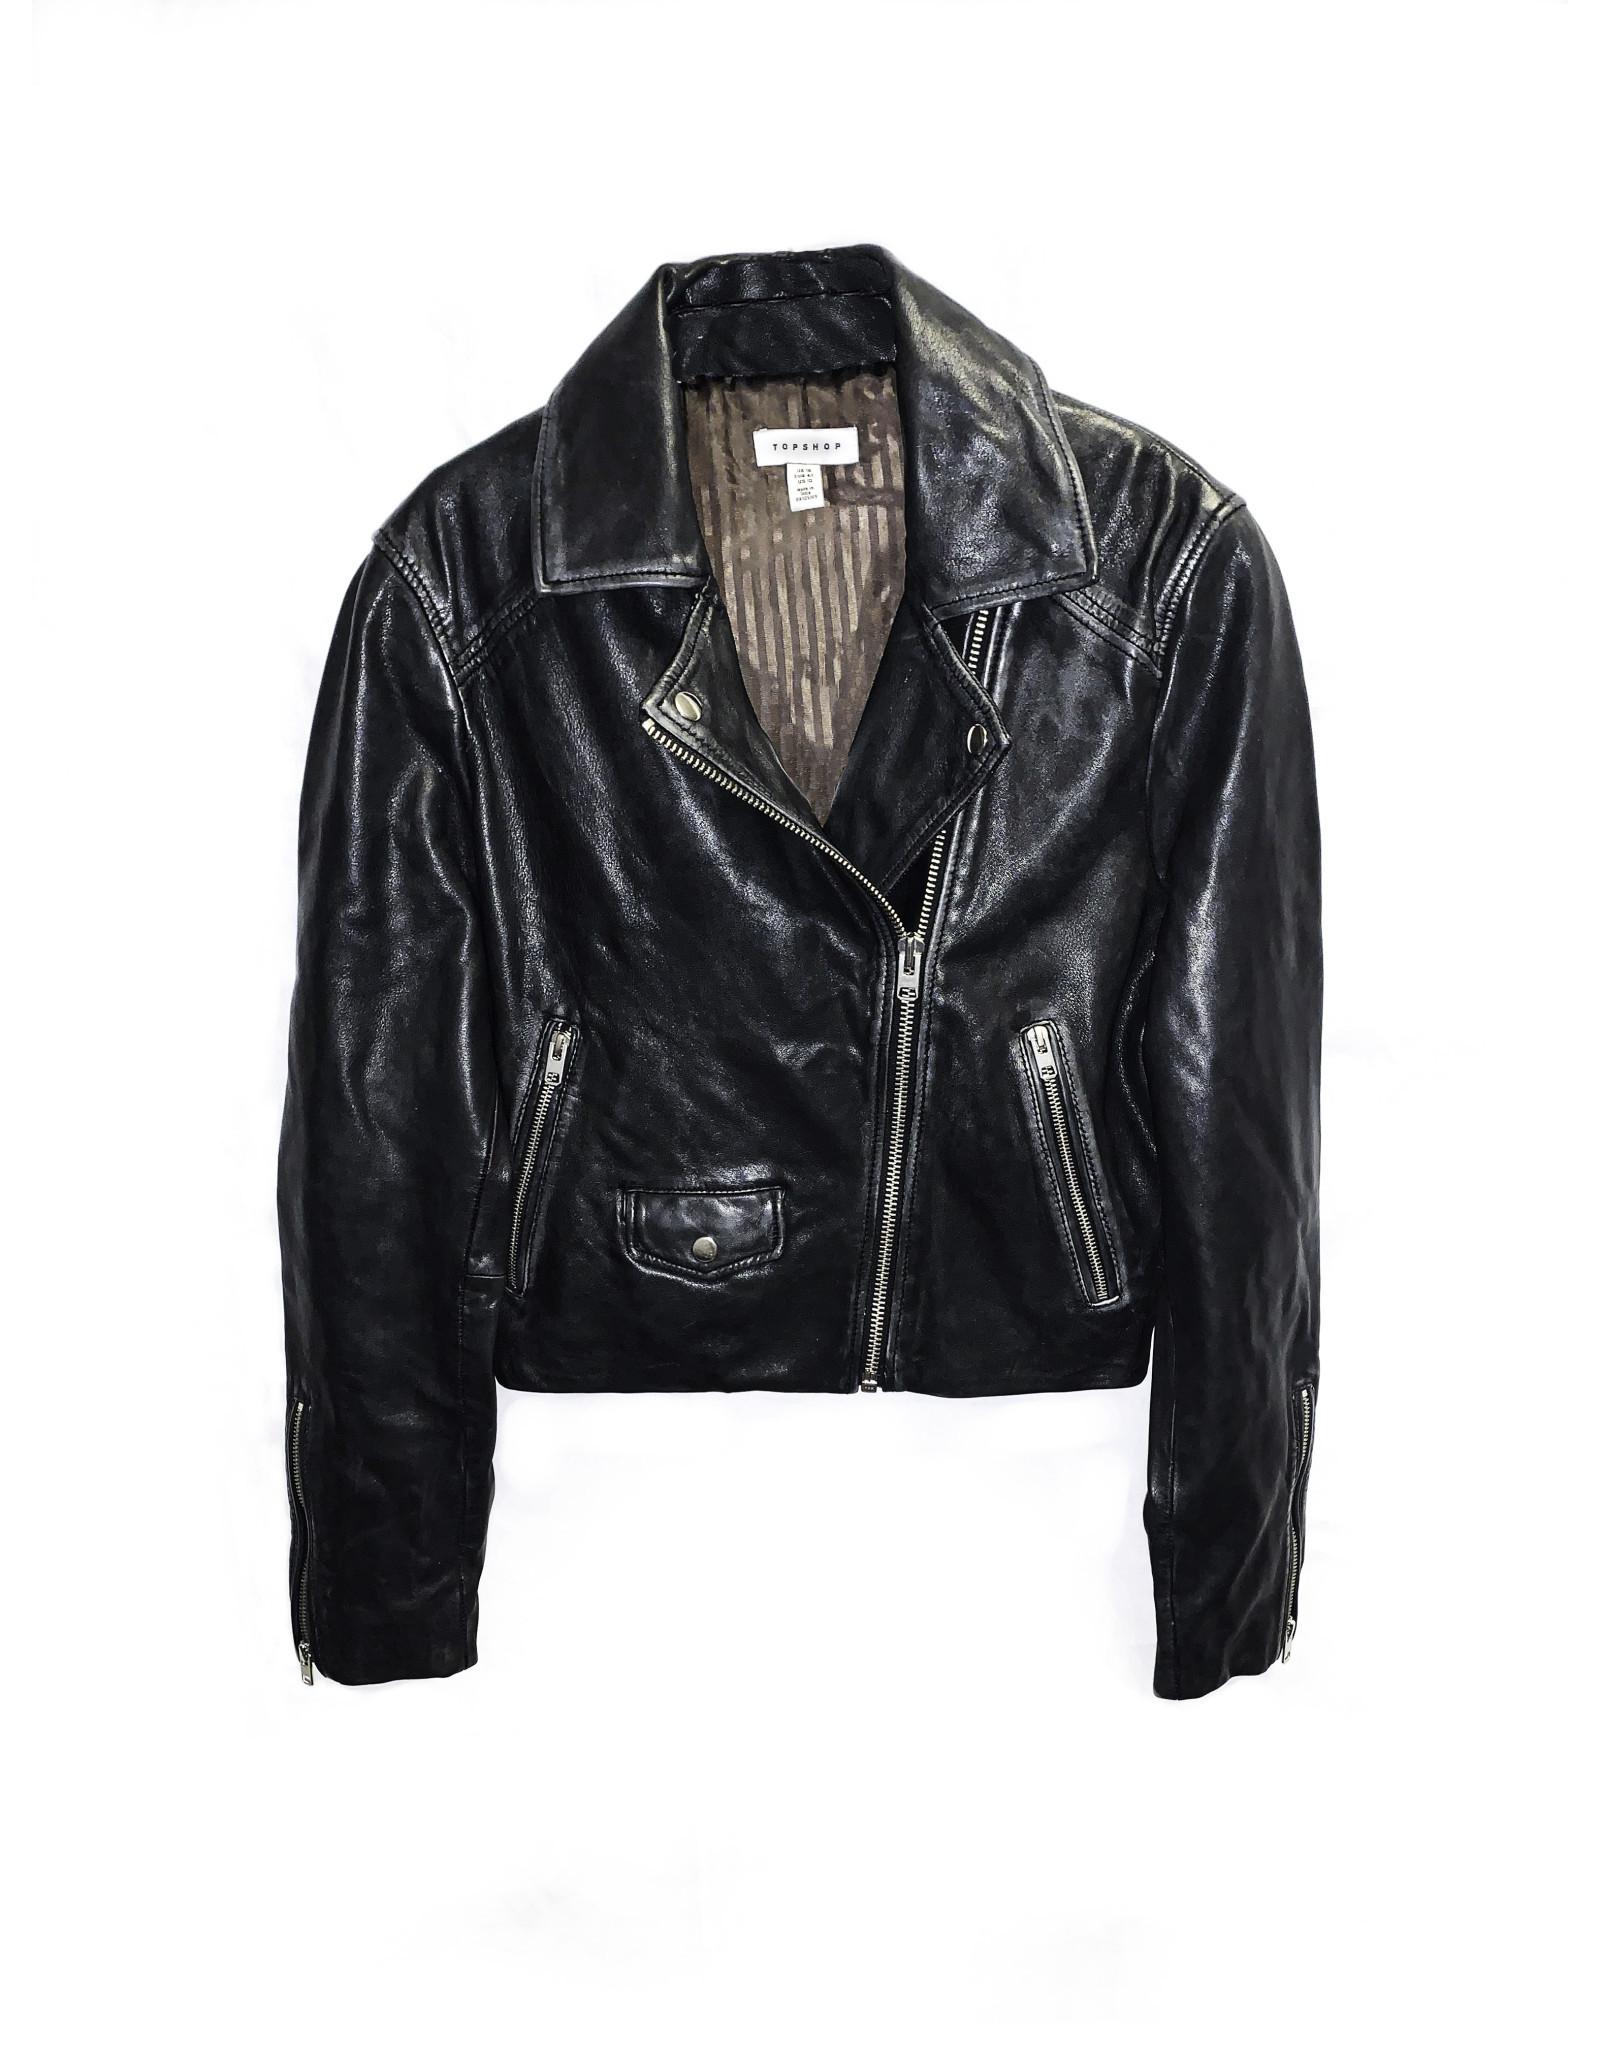 TOPSHOP Topshop Leather Jacket Size: 10